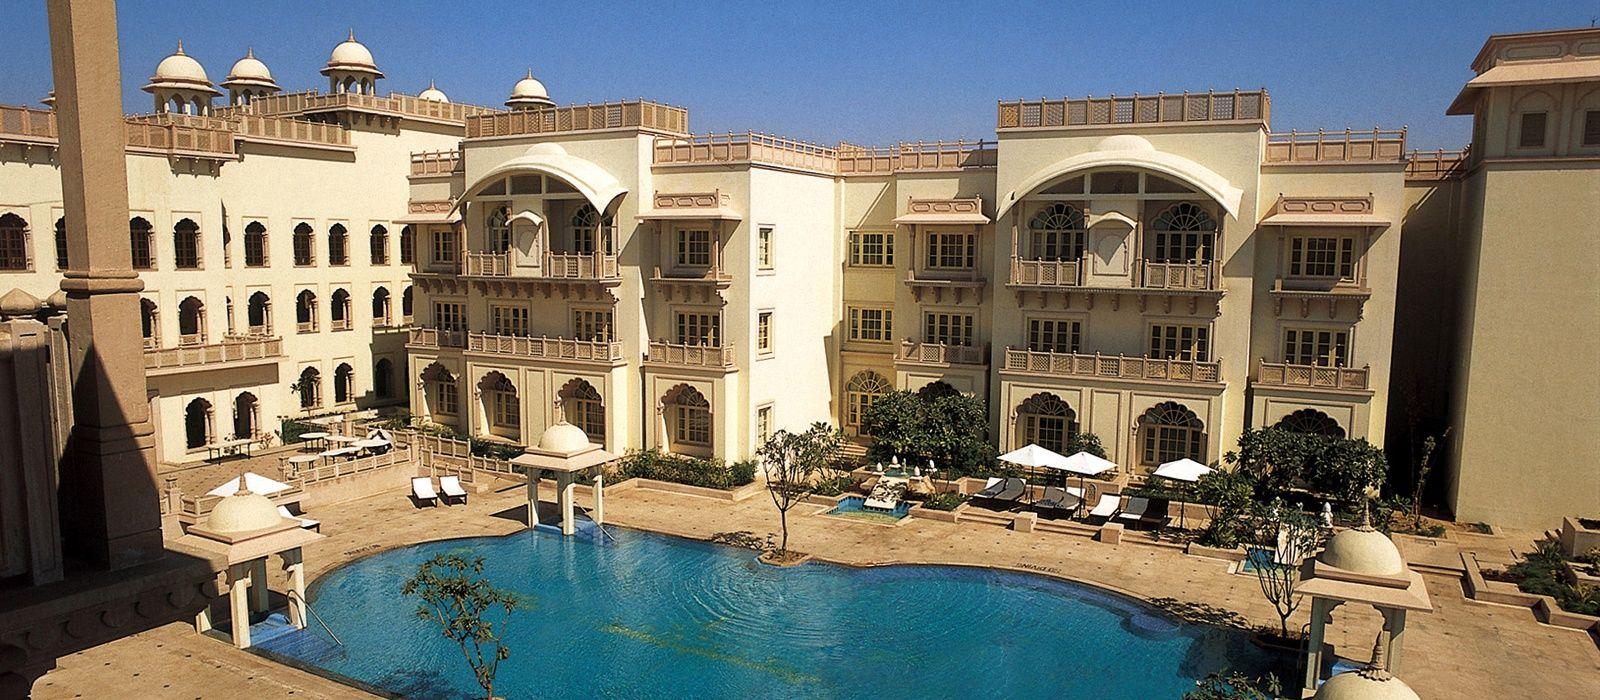 Hotel Vivanta by Taj – Hari Mahal Nordindien